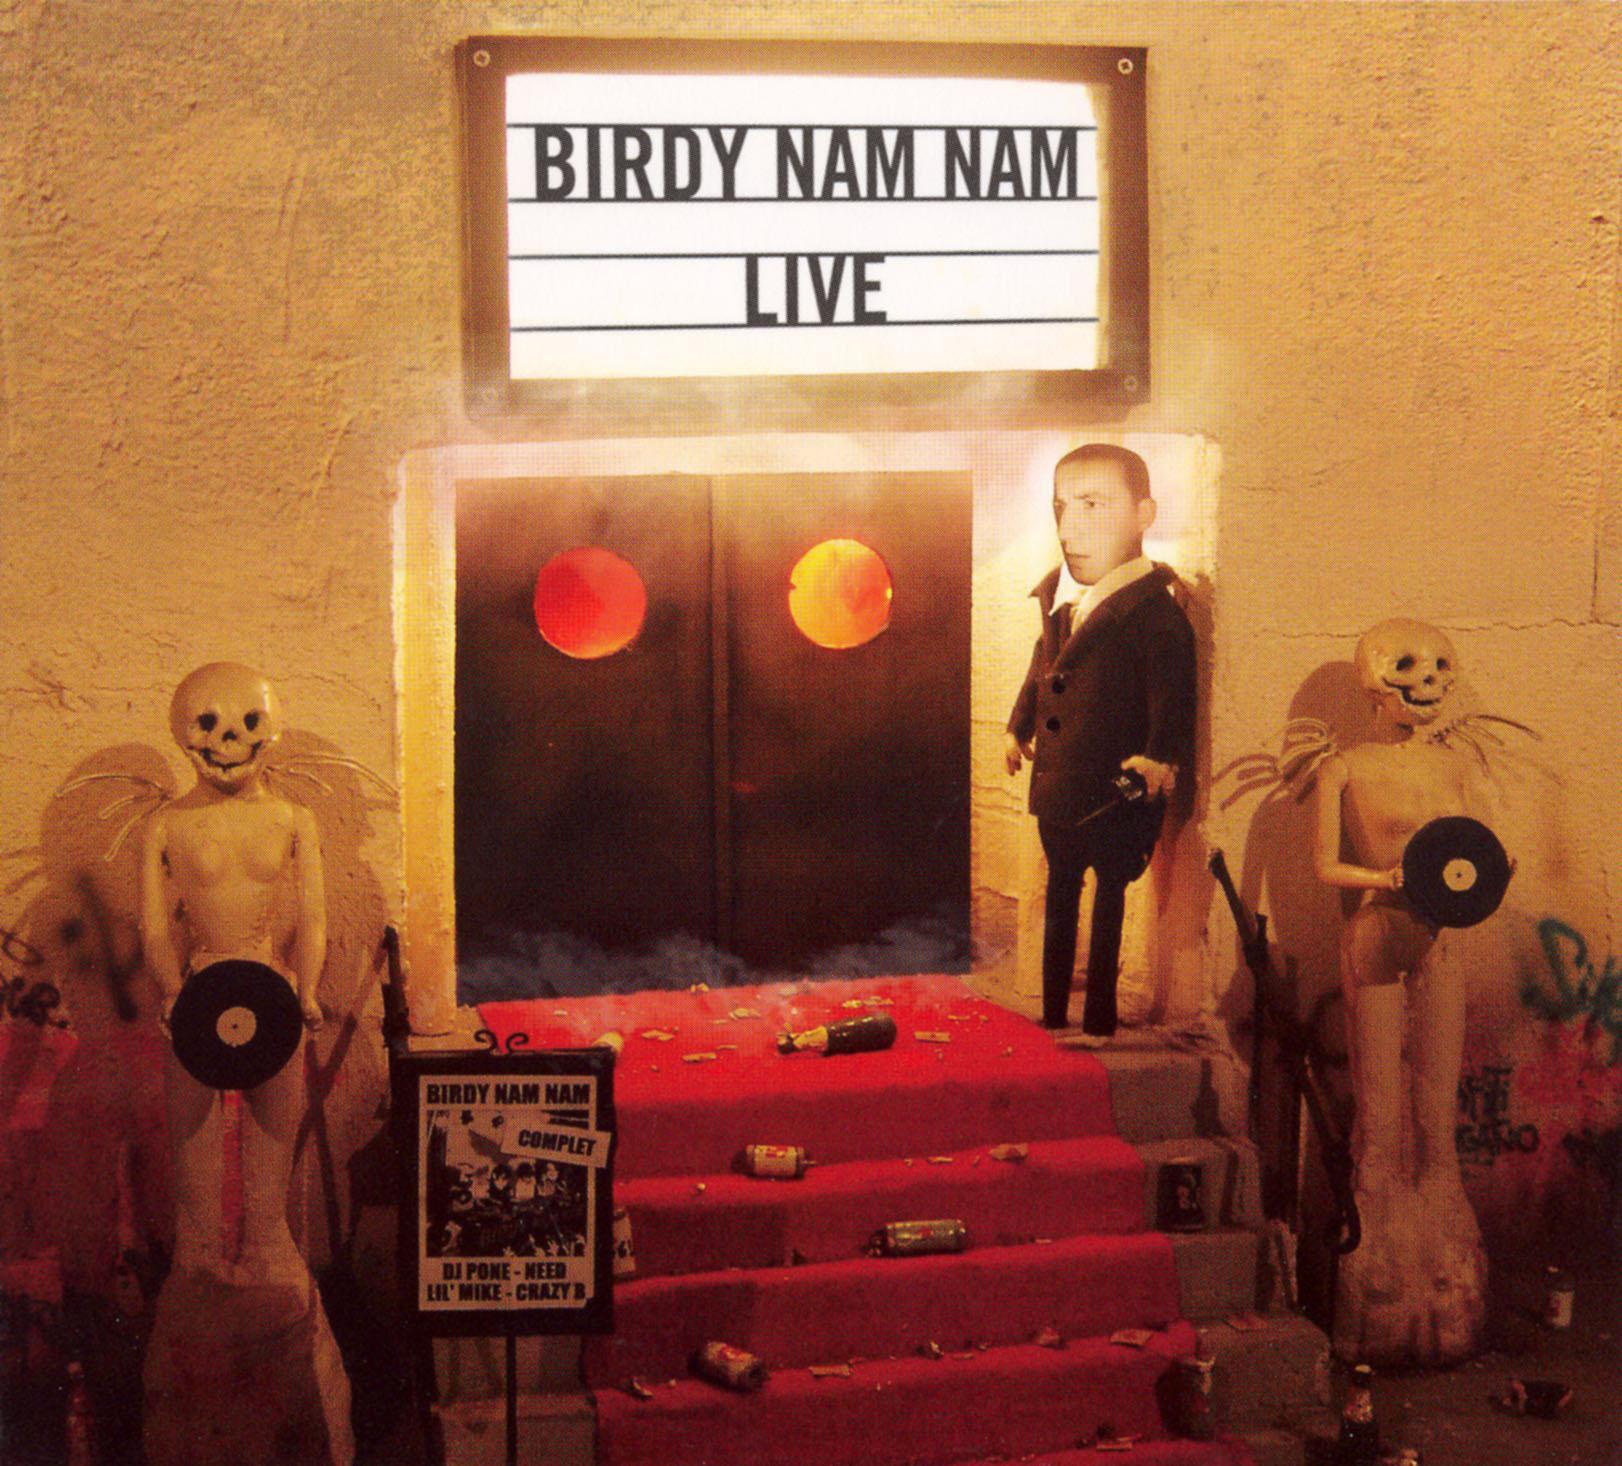 birdy nam nam live releases allmovie. Black Bedroom Furniture Sets. Home Design Ideas